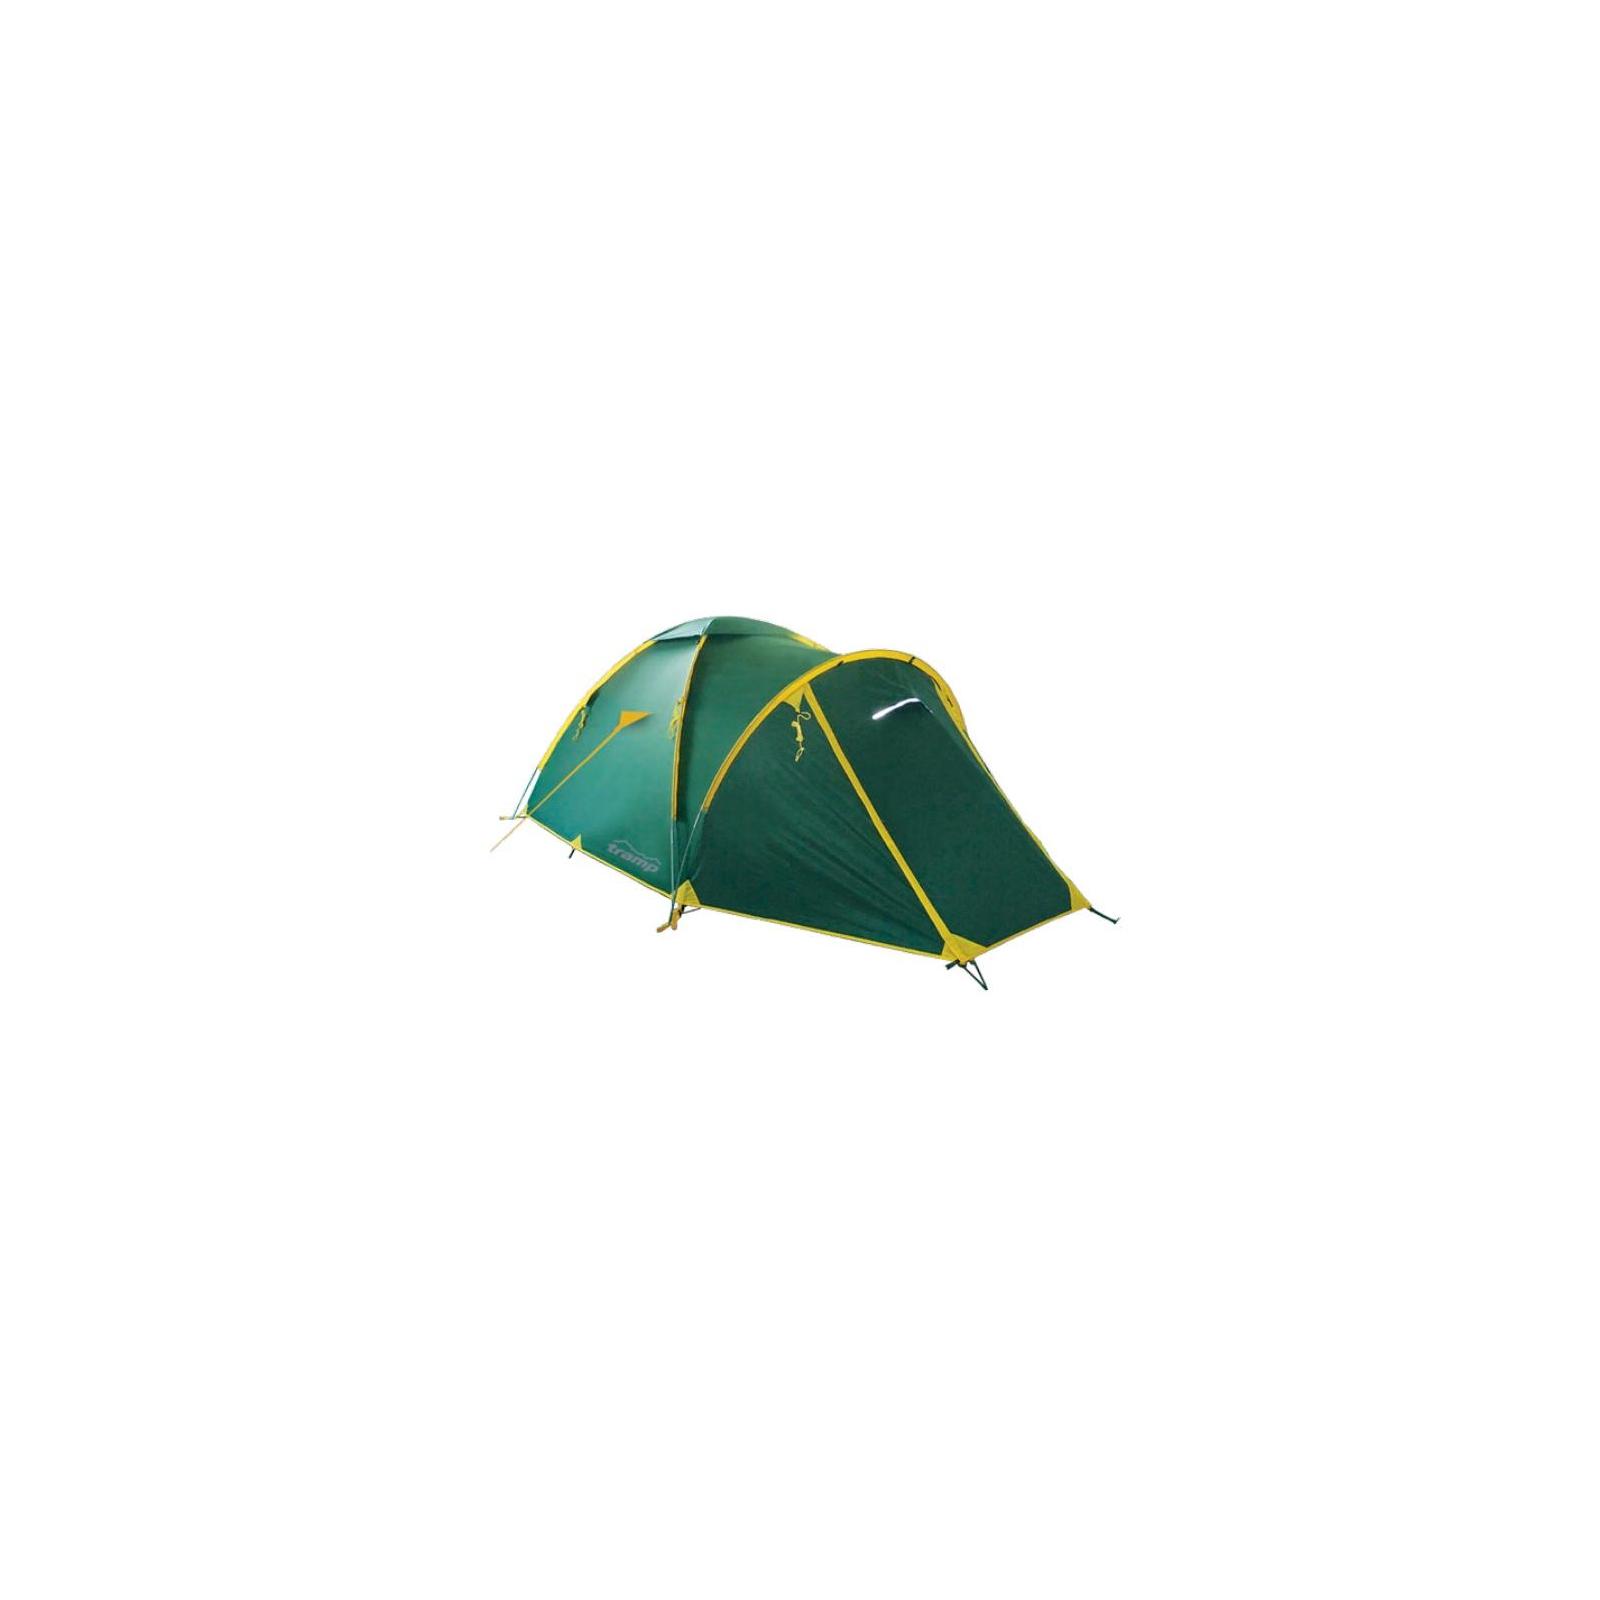 Палатка Tramp SPACE 2 v2 (TRT-058)